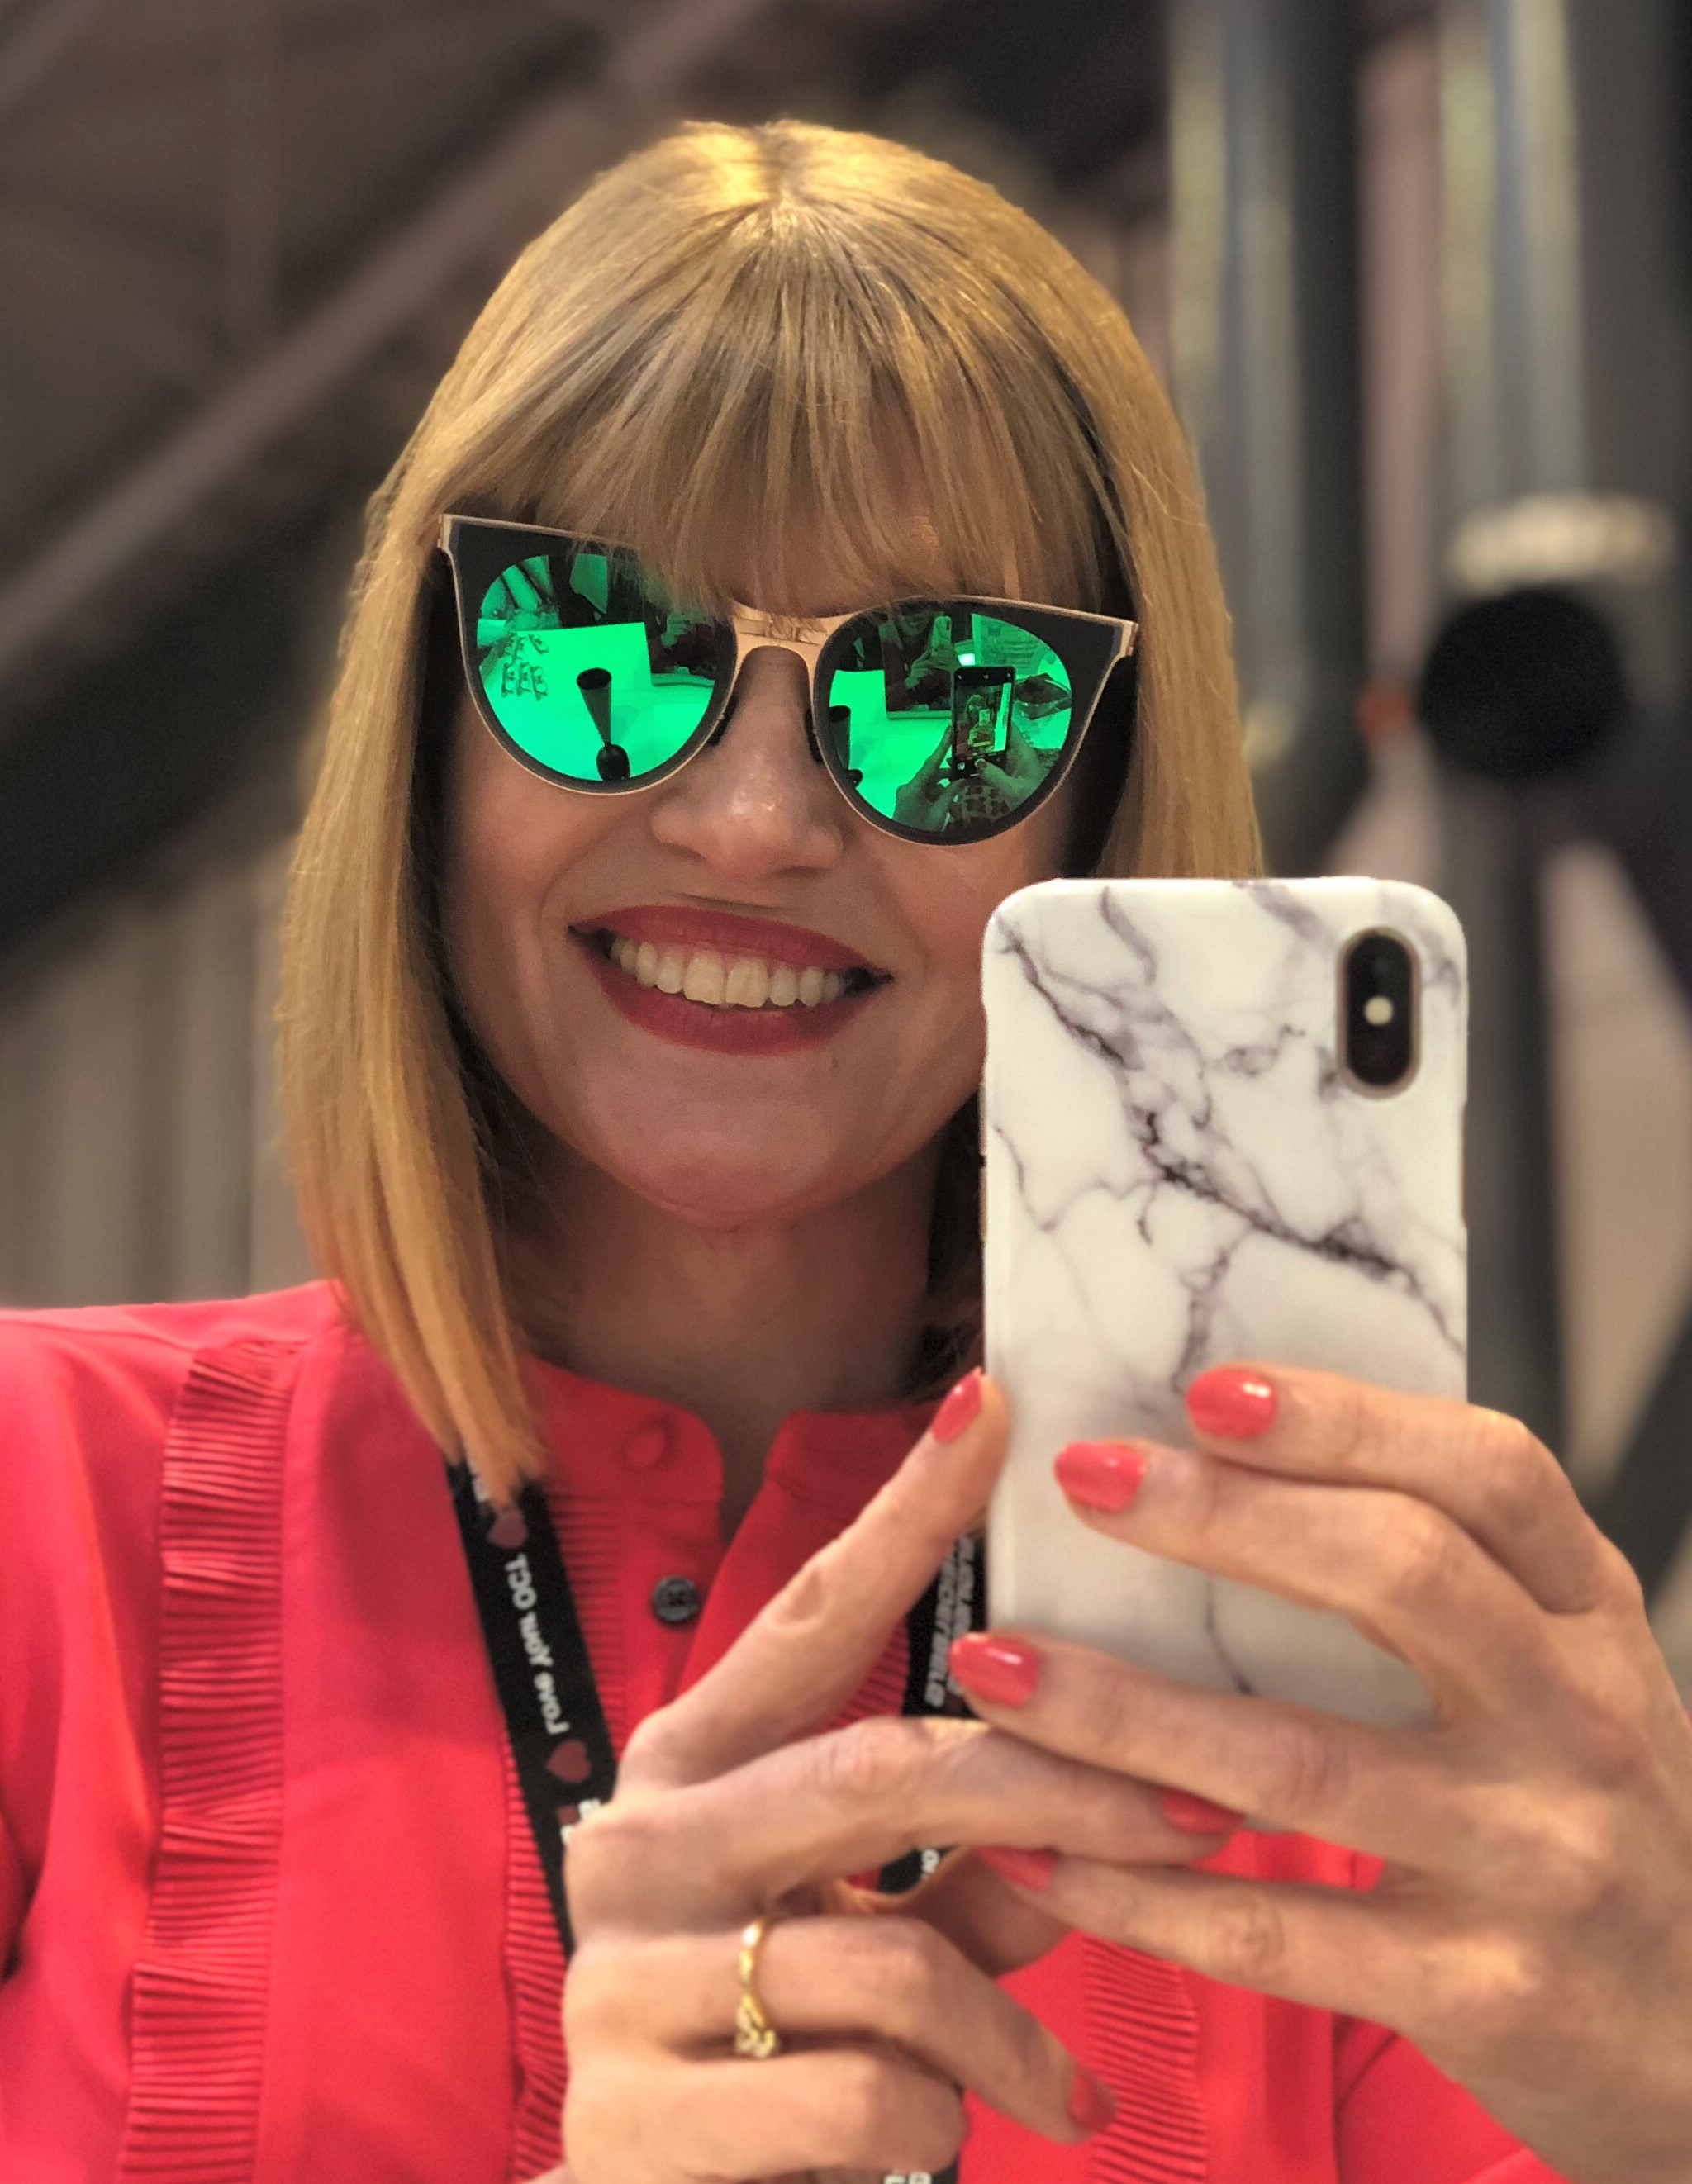 Optrafair 2019 Bondeye Optical ROAV sunglasses